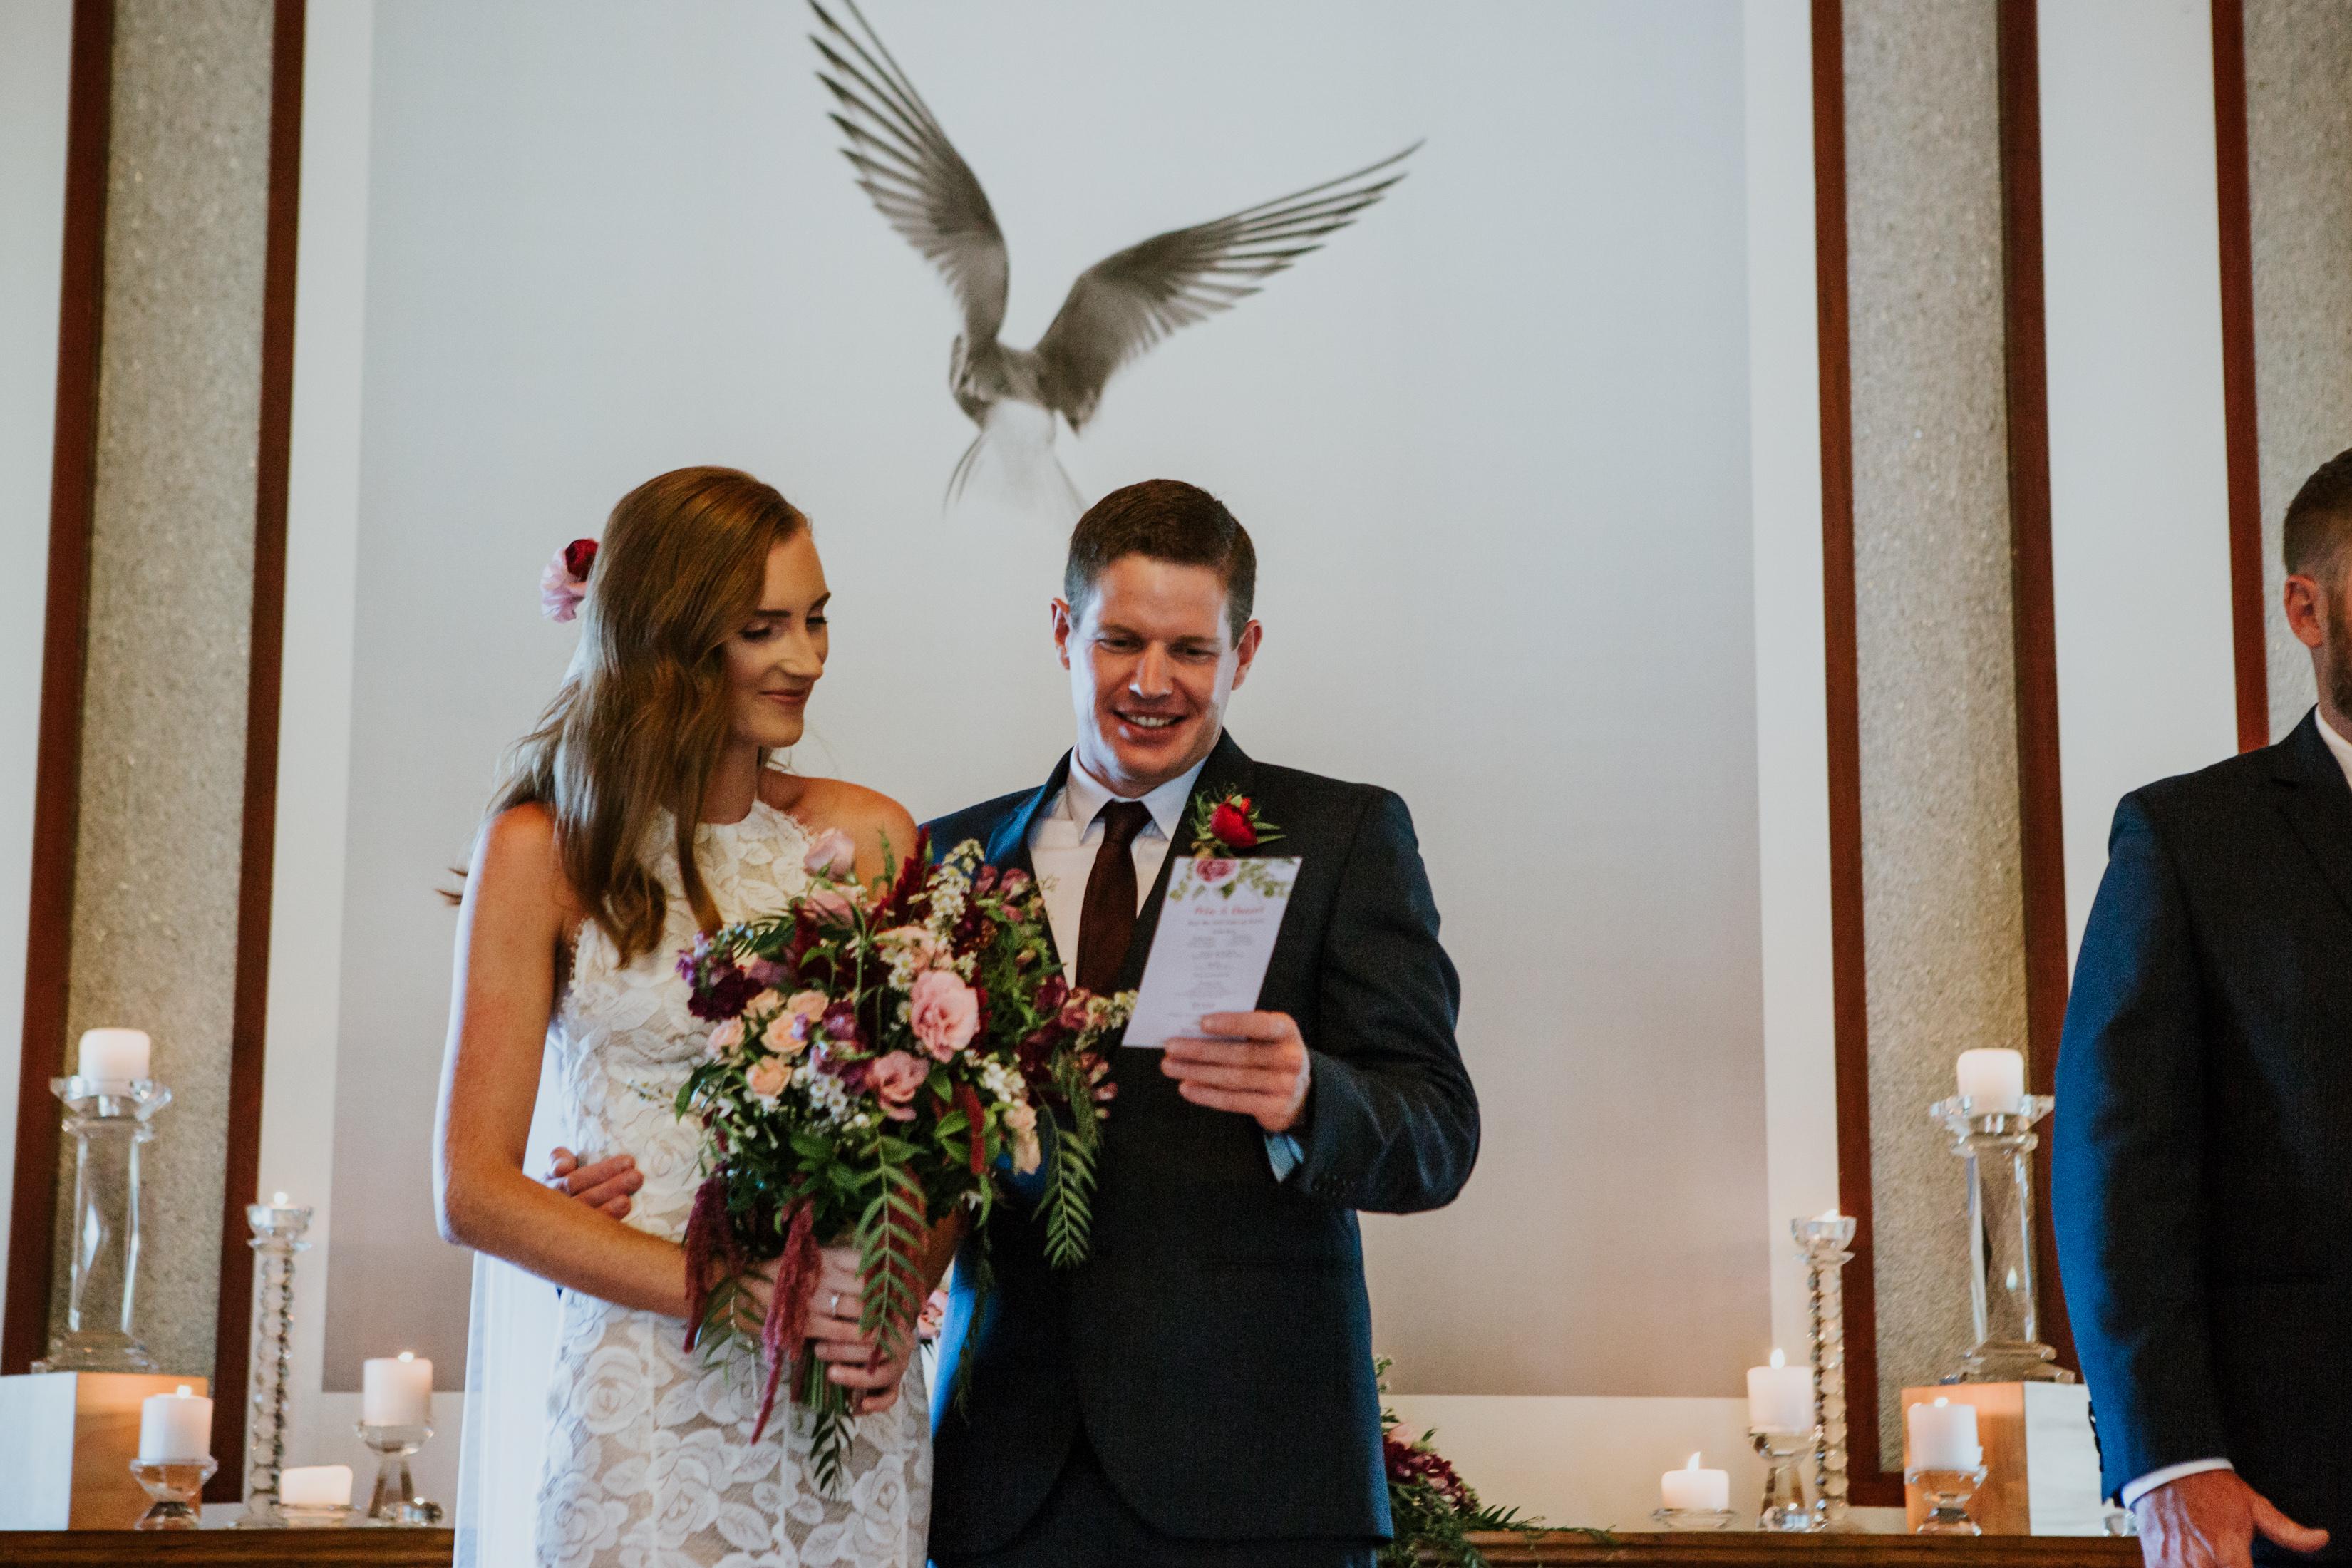 Ceremony inside AnnaBella the Wedding Chapel